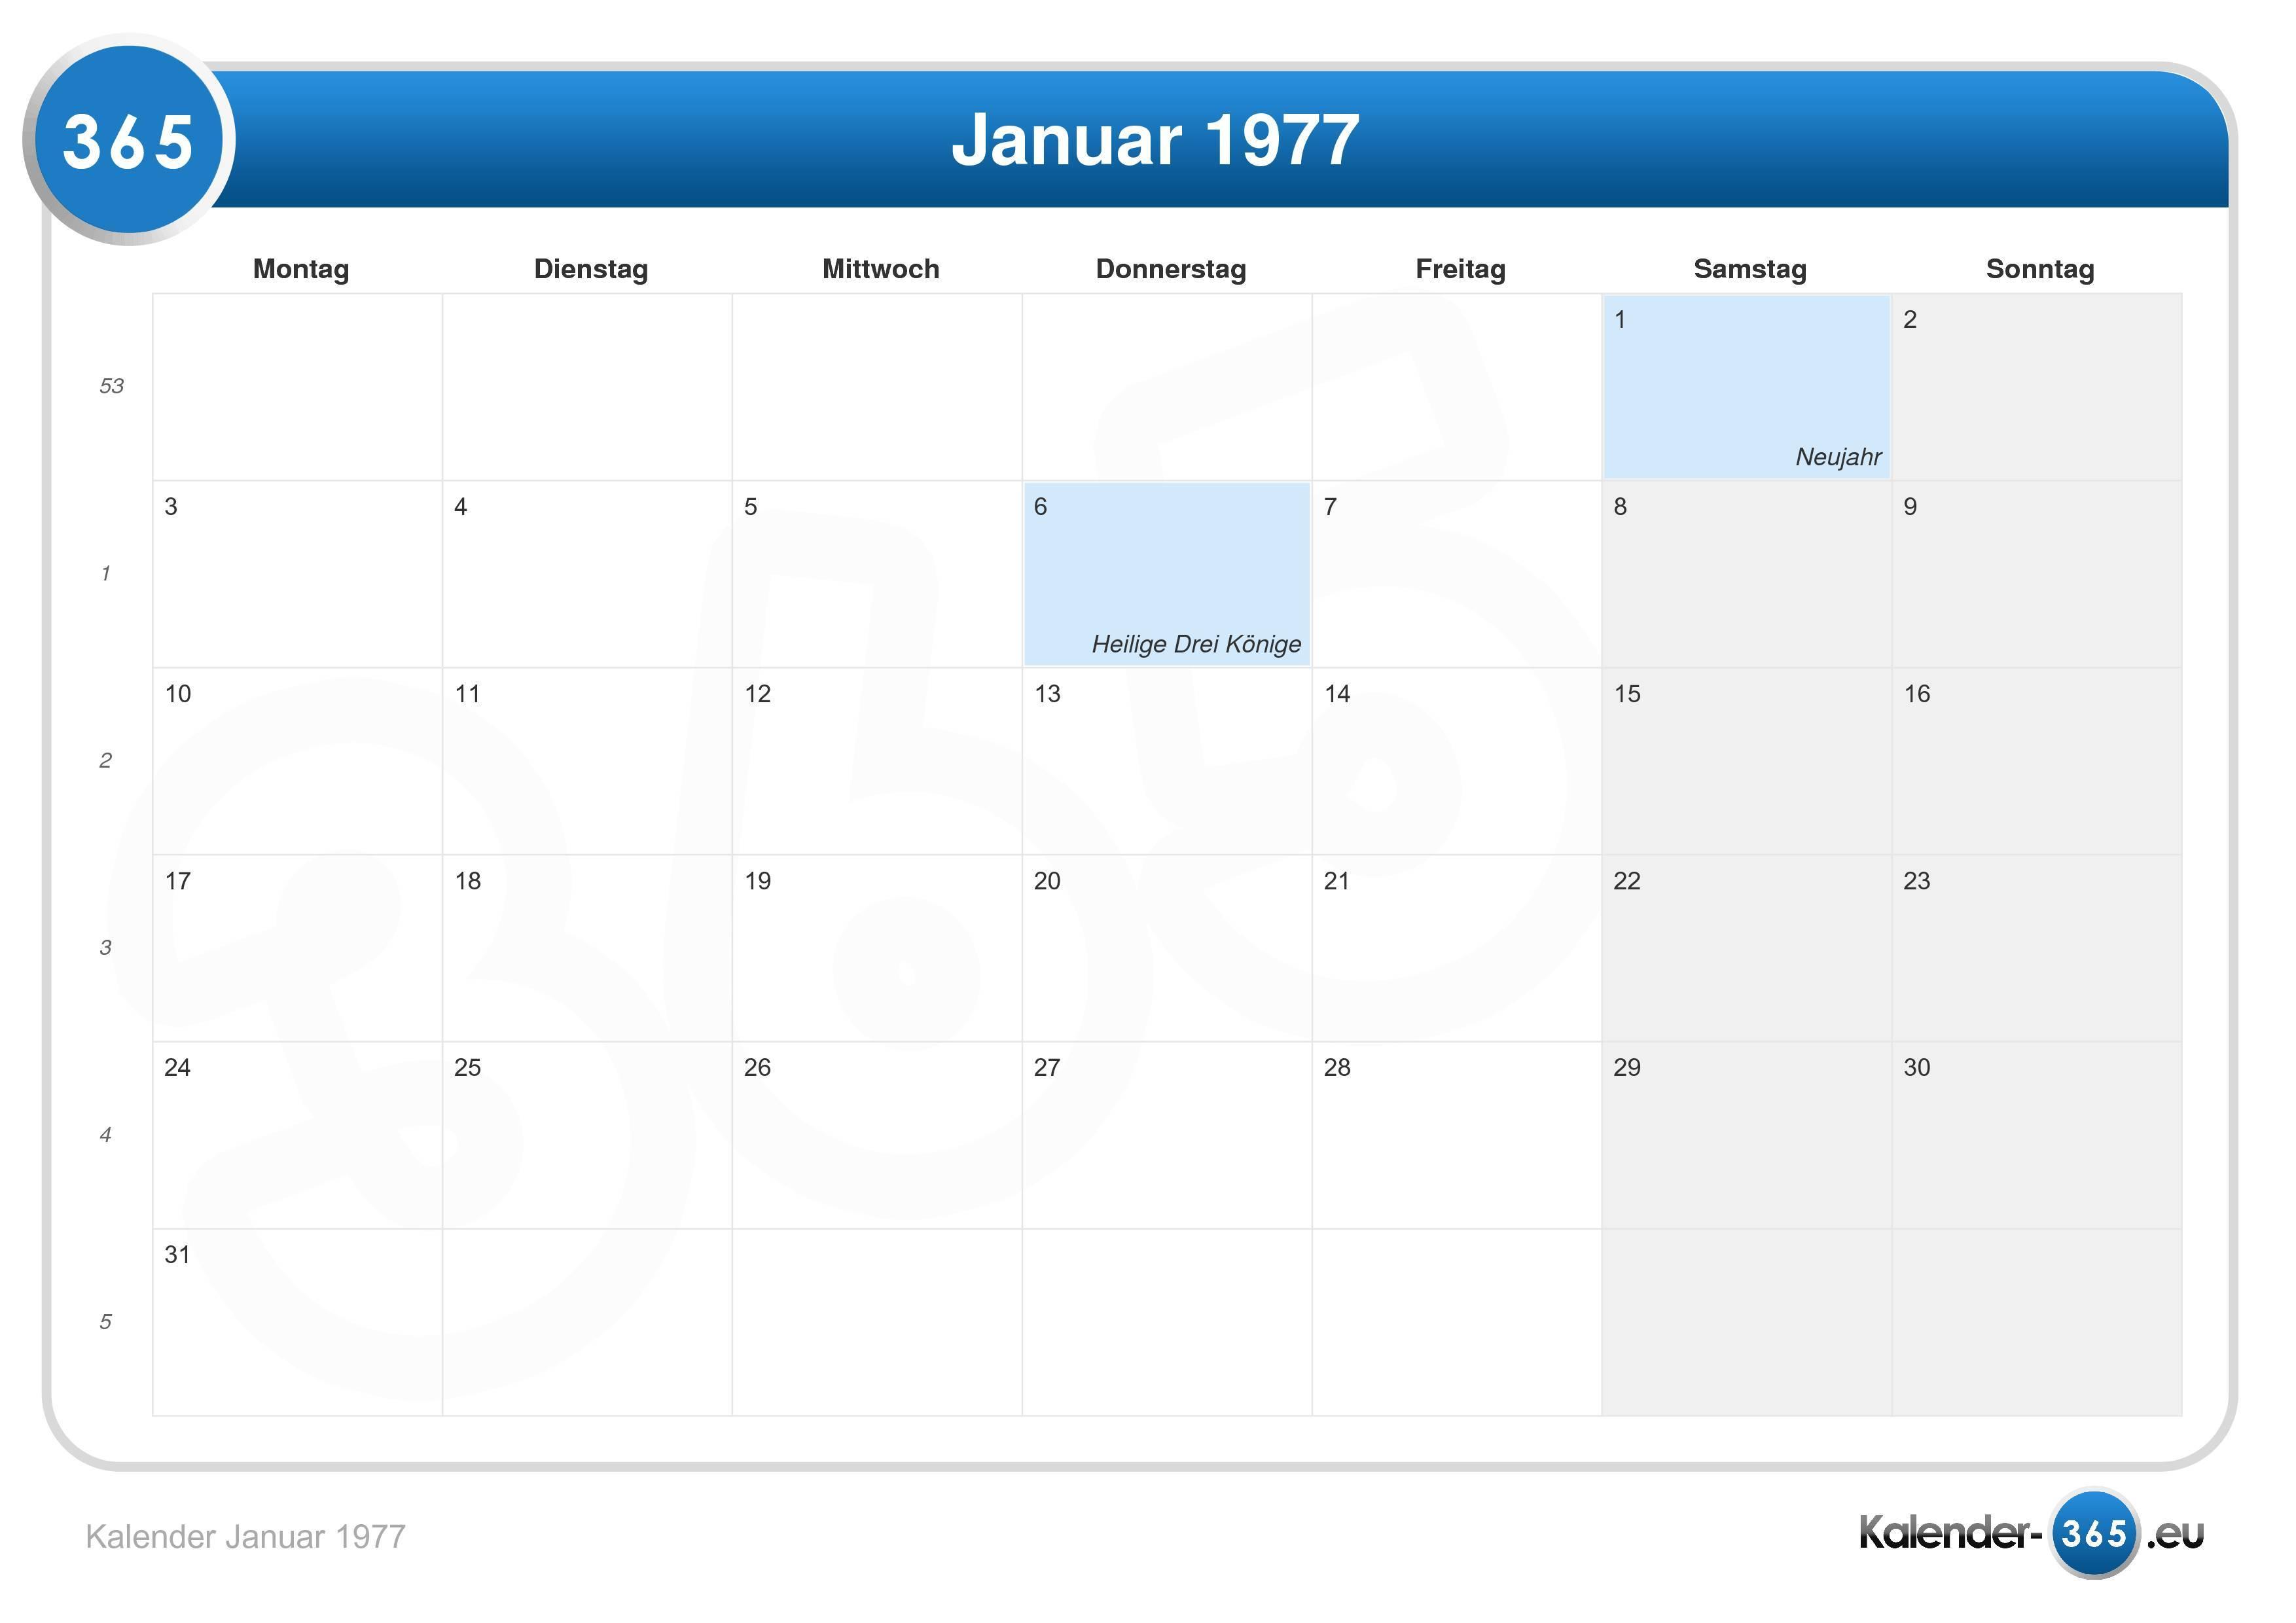 Kalender januar 1977